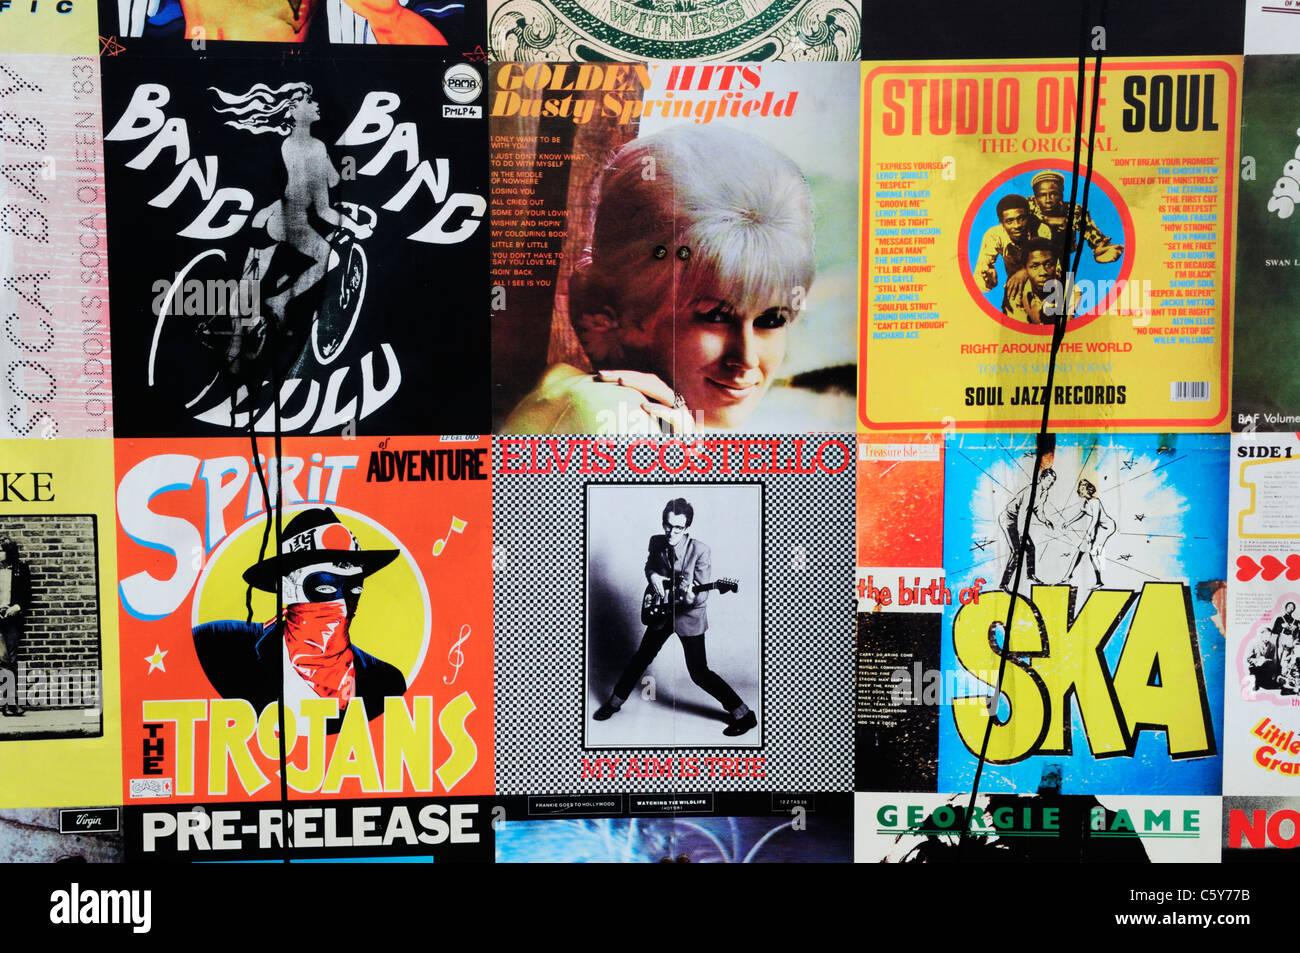 Vinyl LP Album Covers on the Portobello ReCollection Wall, Portobello Road, Notting Hill, London, England, UK - Stock Image